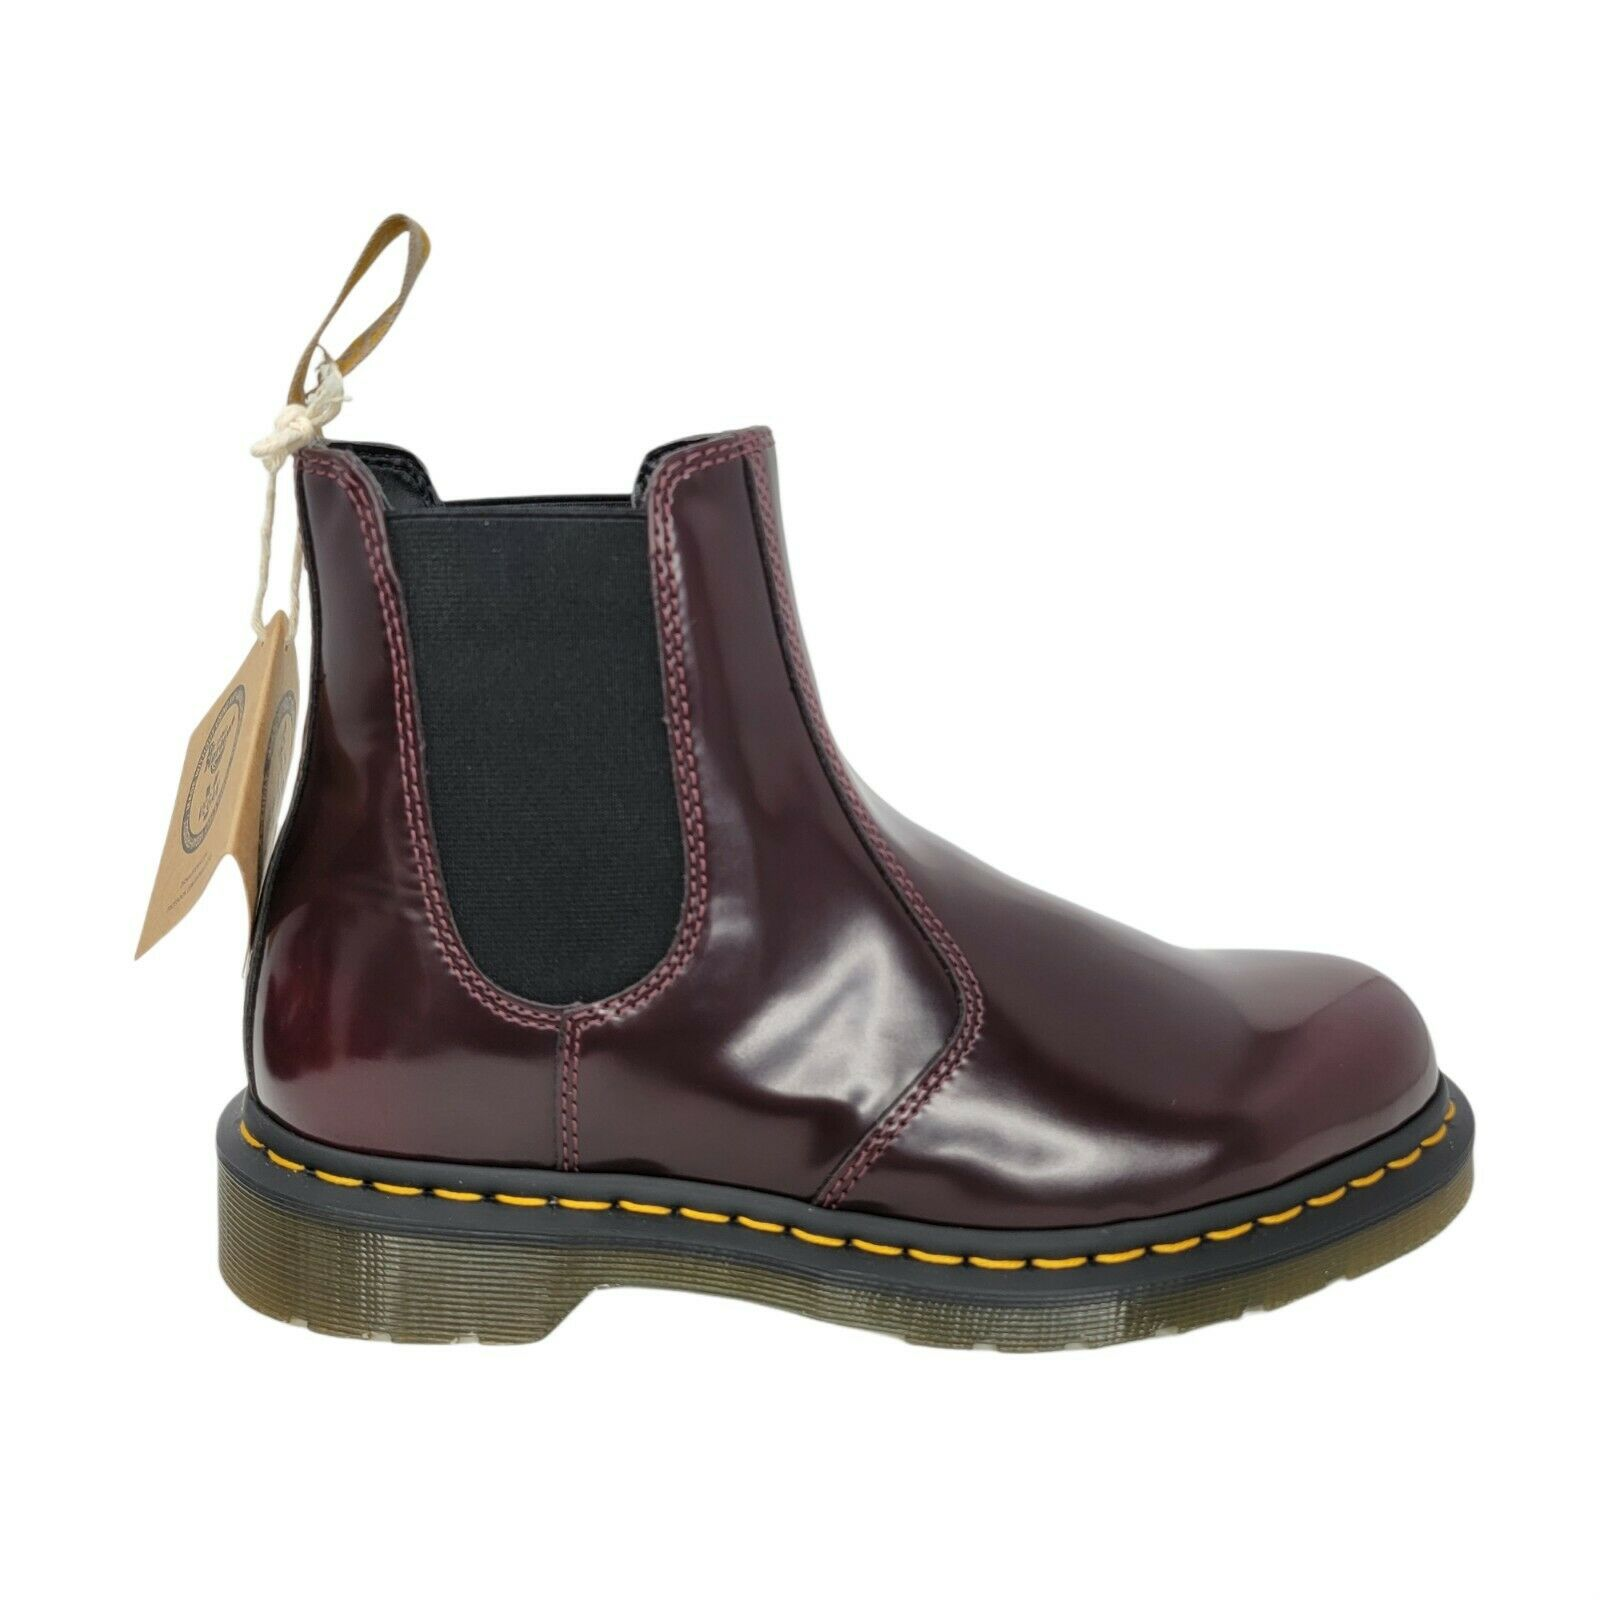 Dr. Doc Martens Vegan 2976 Chelsea Boots Cherry Red Men's Size 5 Women's 6